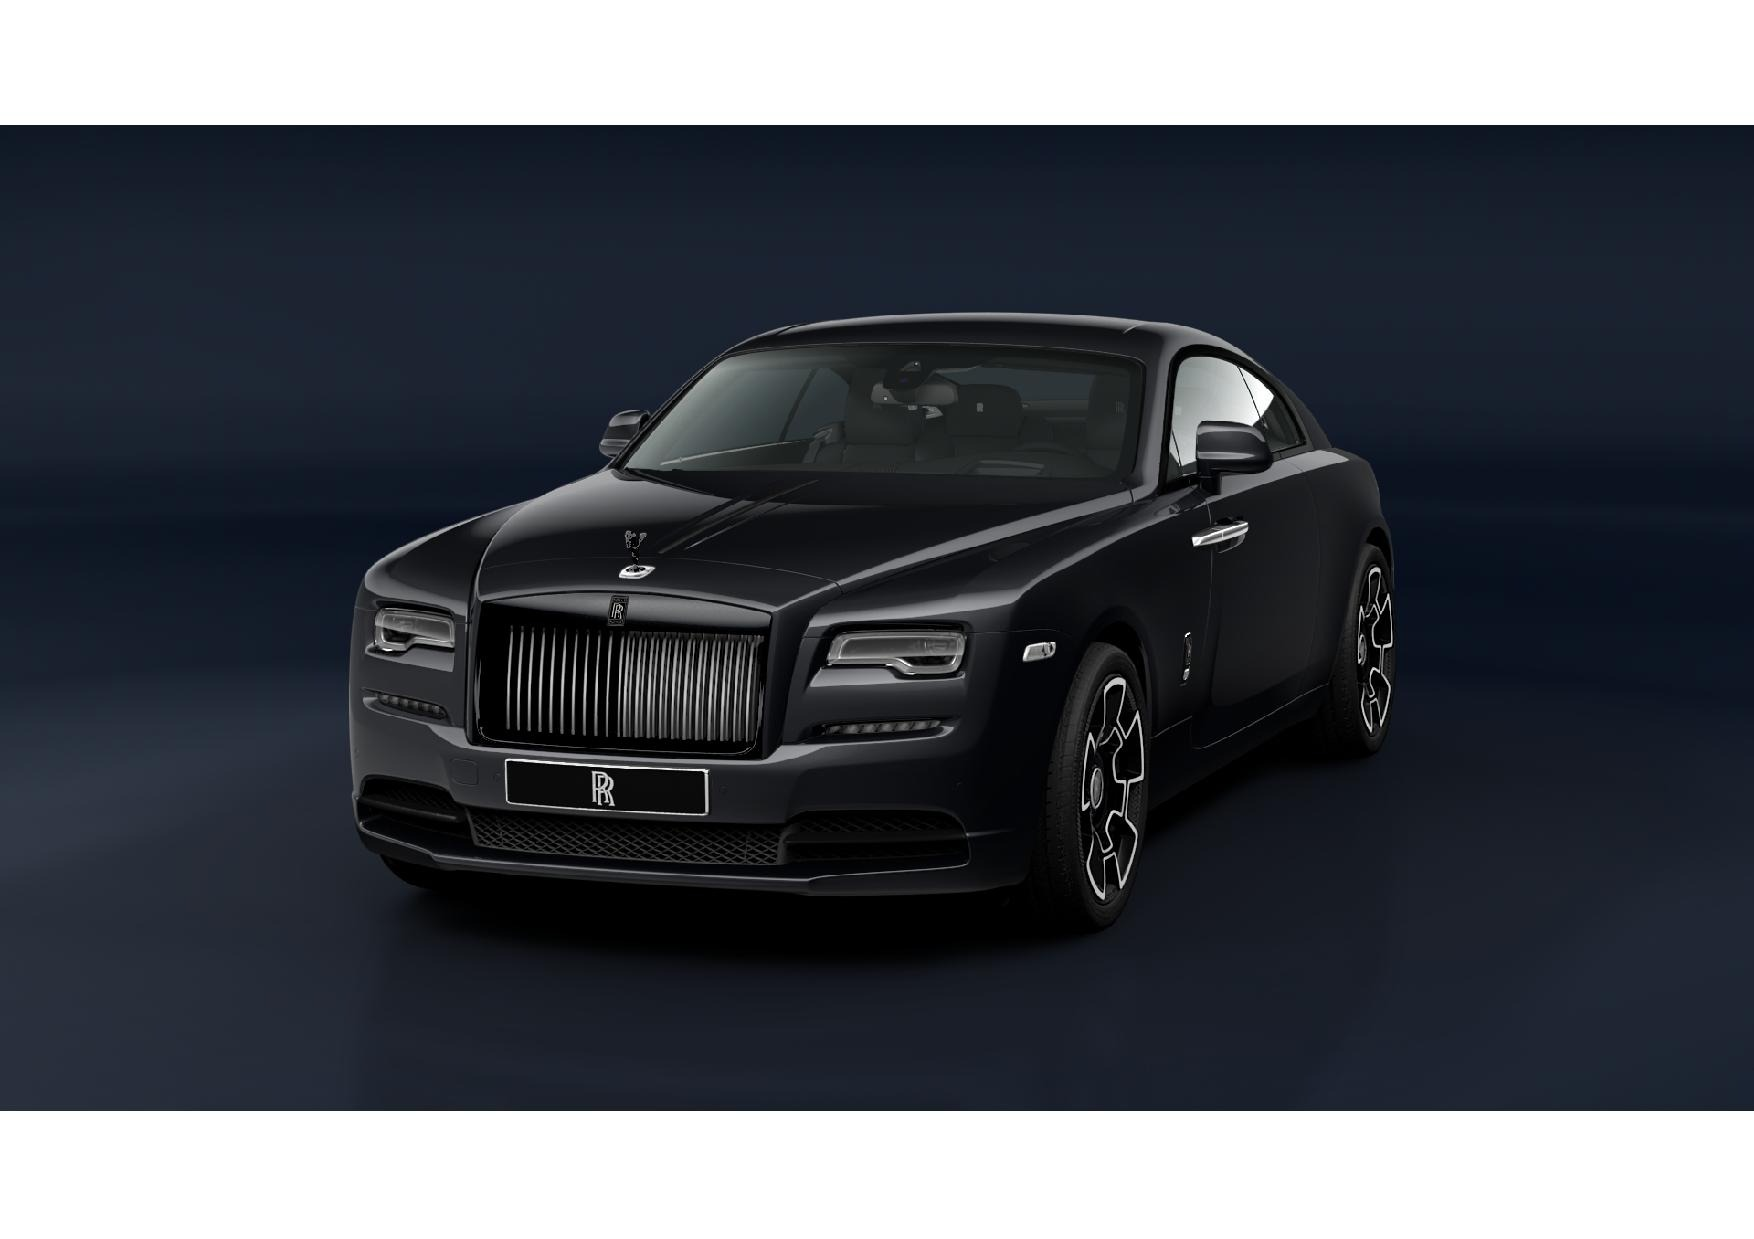 New 2021 Rolls Royce Wraith Black Badge